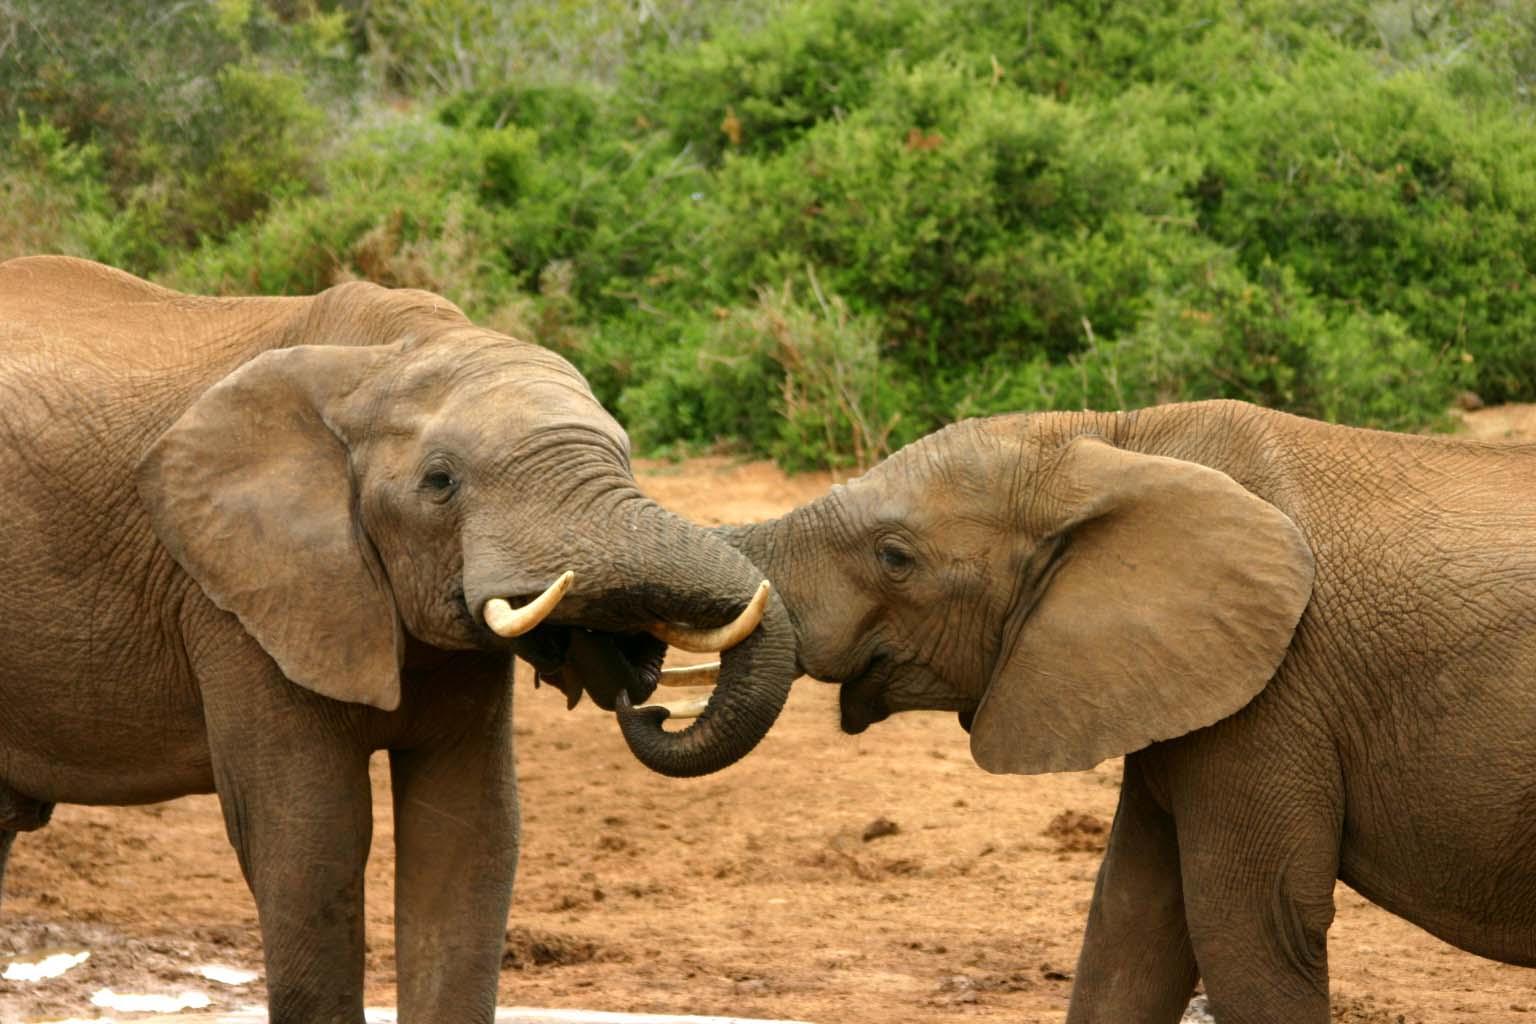 File:Elephant mating ritual.jpg - Wikimedia Commons